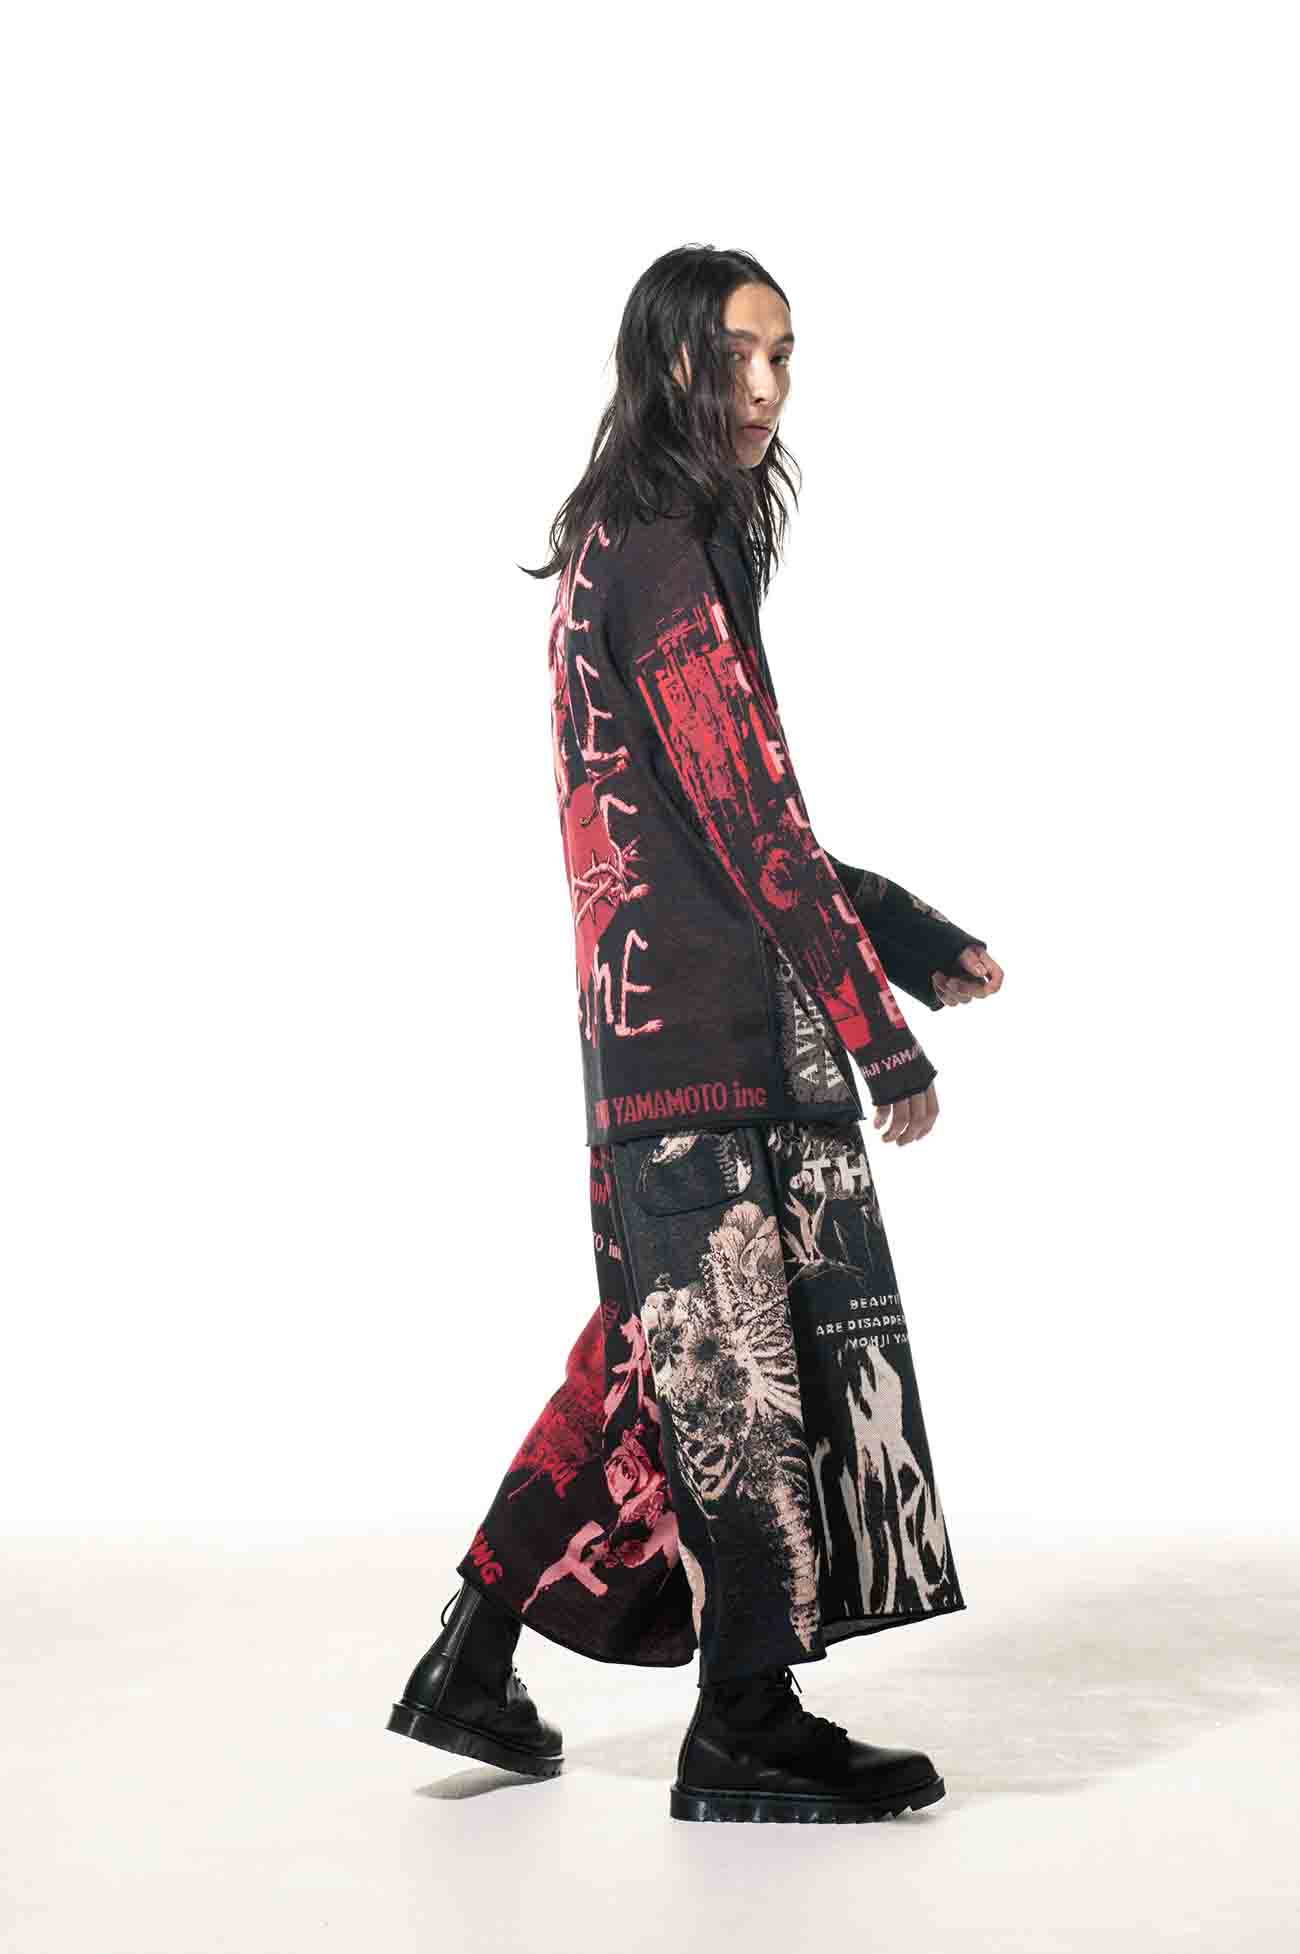 Hameauze Jacquard Khaki/Red Graphic Omnibus Culottes Pants